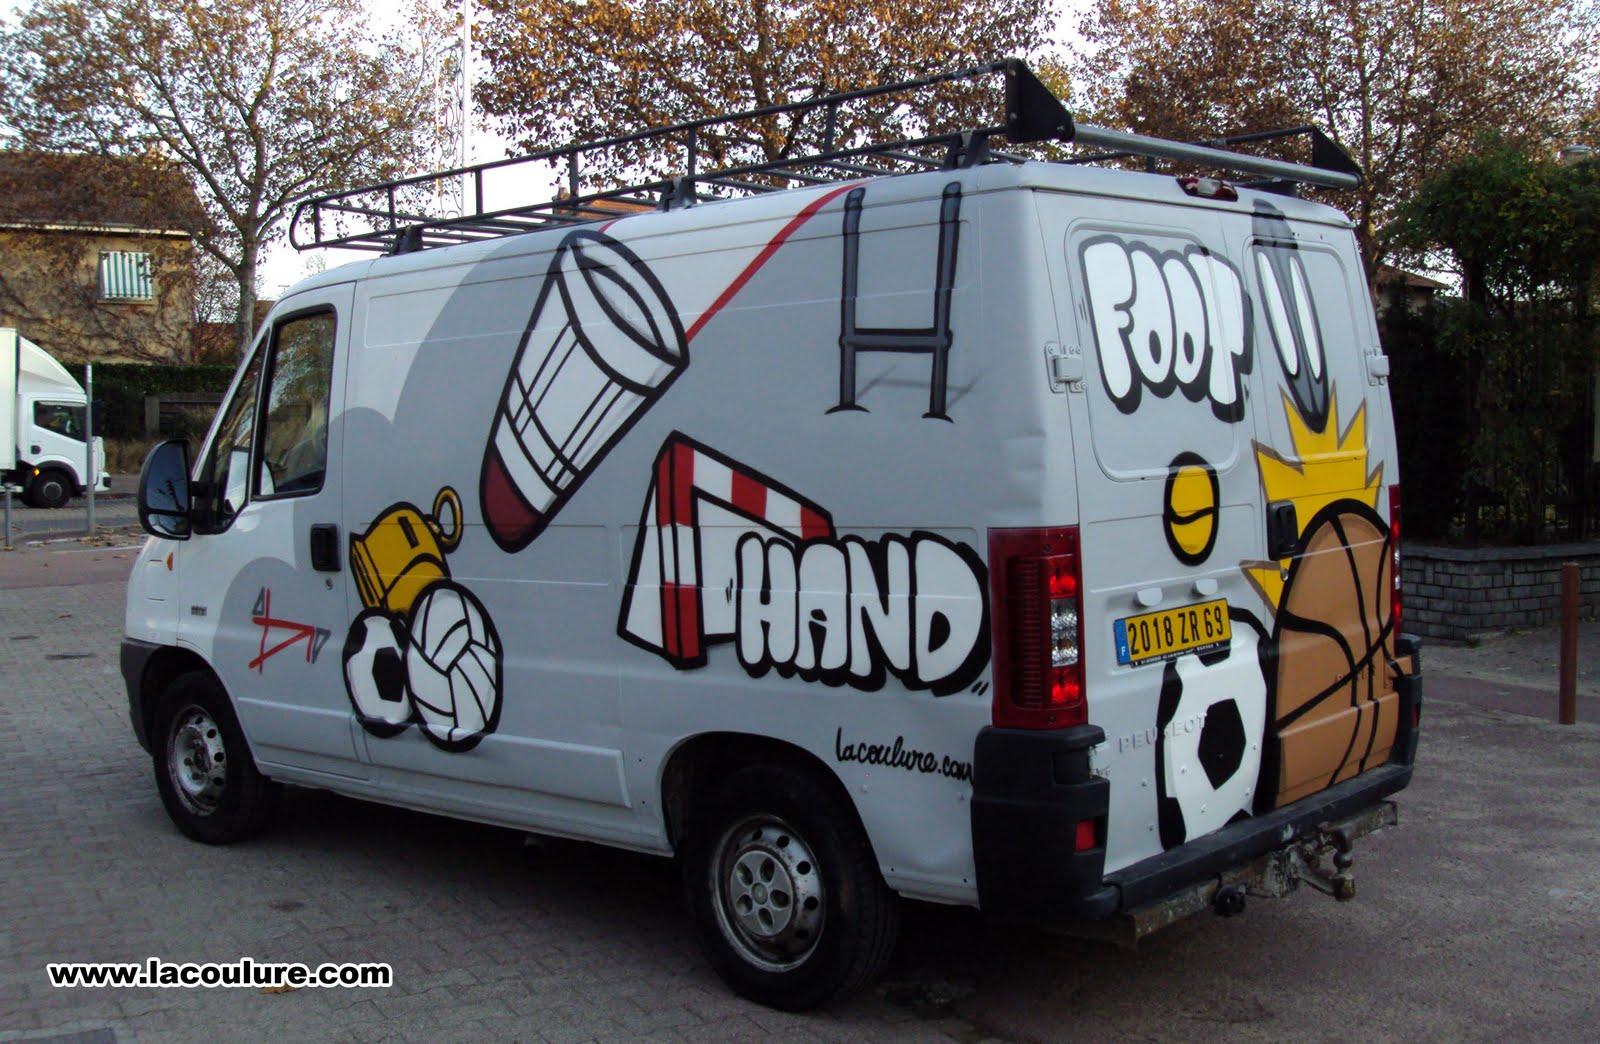 collectif la coulure graffiti lyon camionette sport. Black Bedroom Furniture Sets. Home Design Ideas